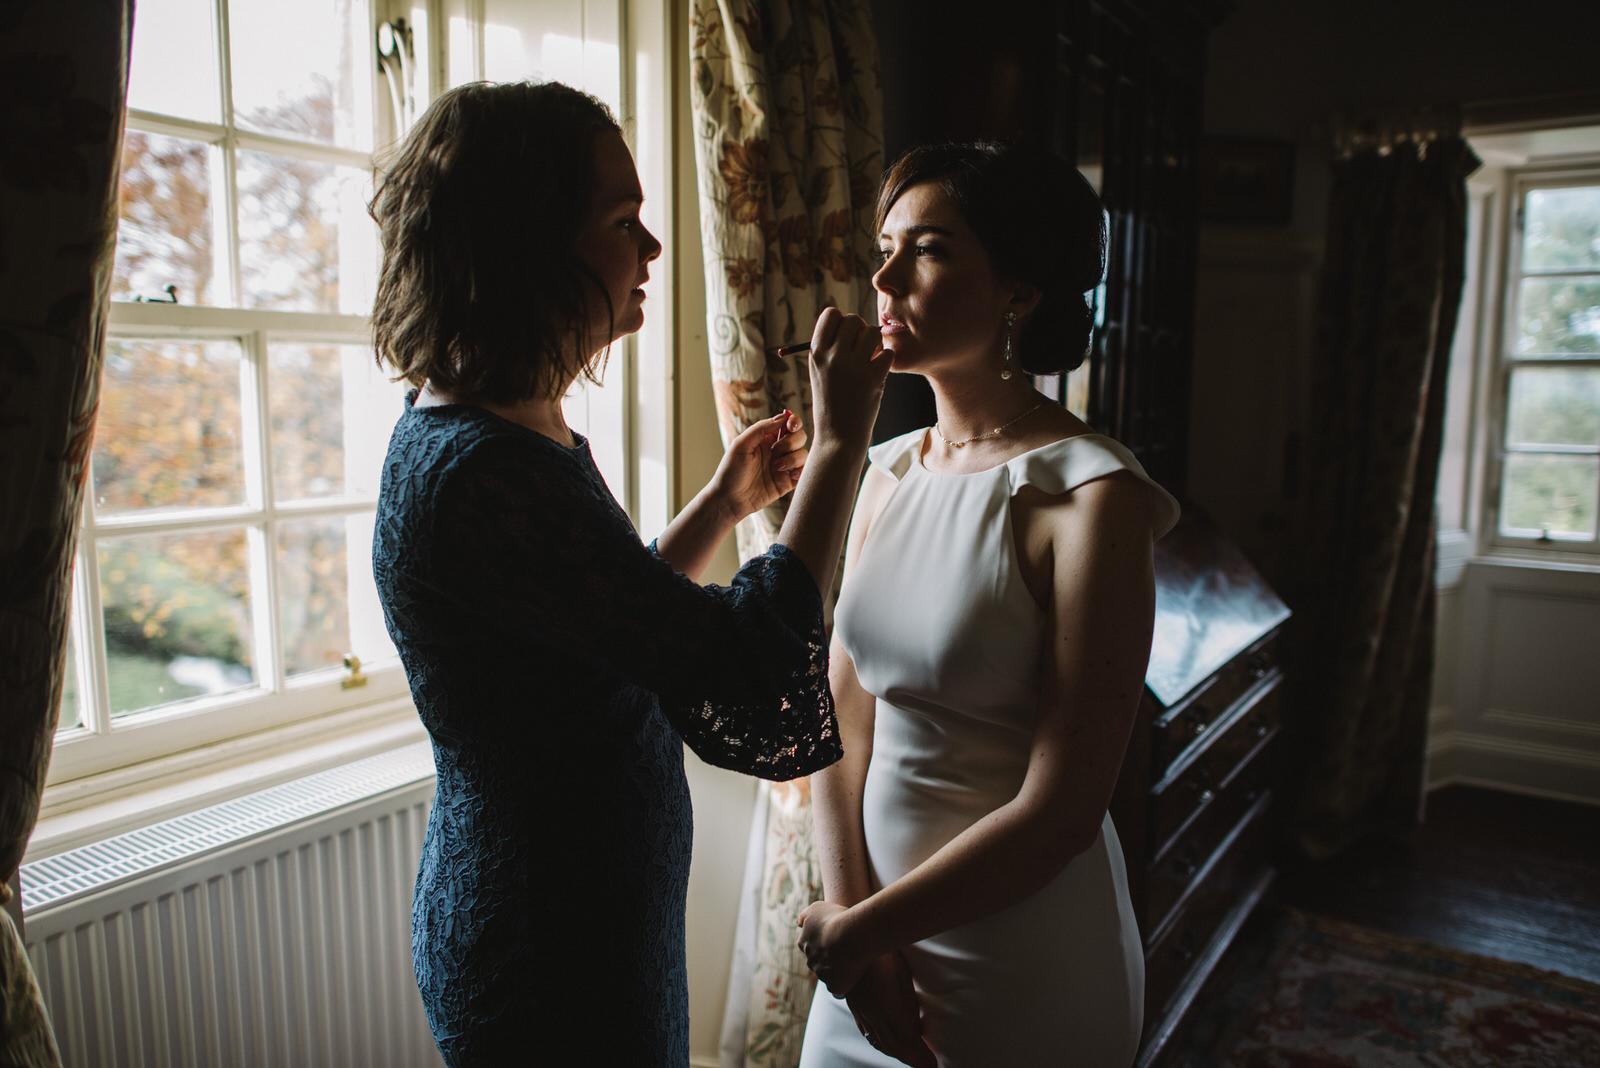 012-COLSTOUN-HOUSE-WEDDING-ALTERNATIVE-WEDDING-PHOTOGRAPHER-GLASGOW-WEDDING-PHOTOGRAPHER-STYLISH-SCOTTISH-WEDDING.JPG